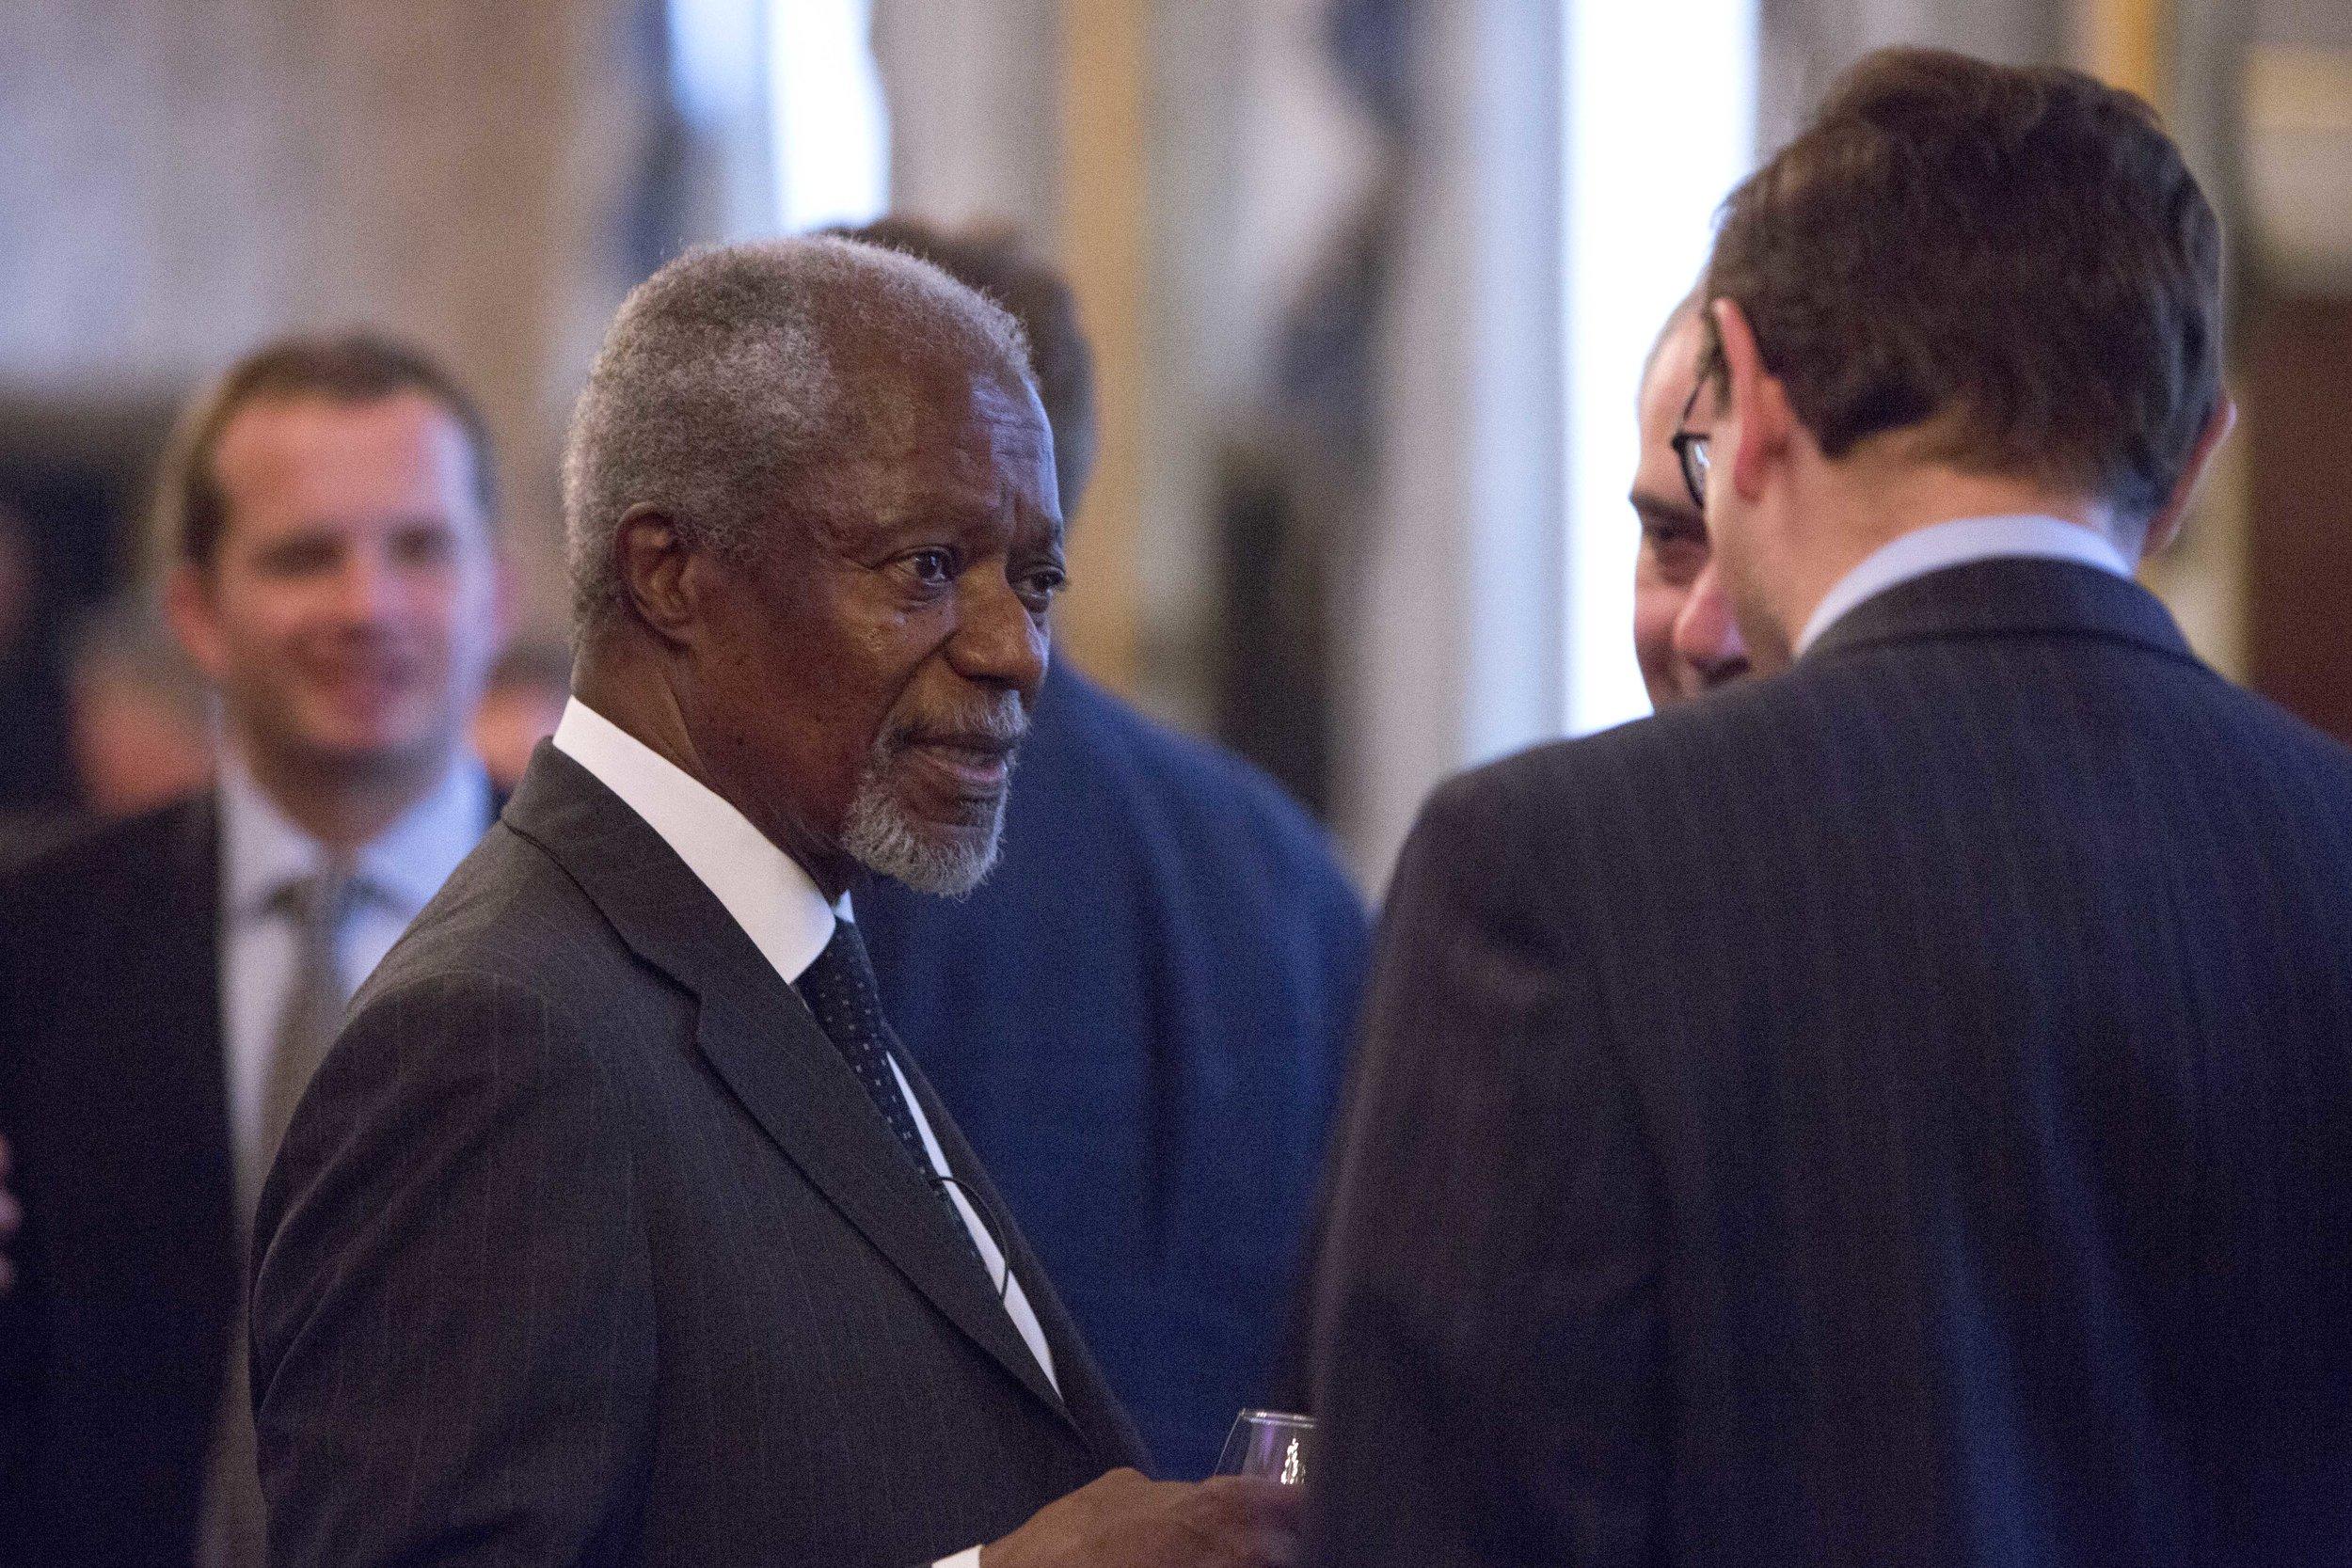 The late Kofi Annan, former Secretary-General of the UN